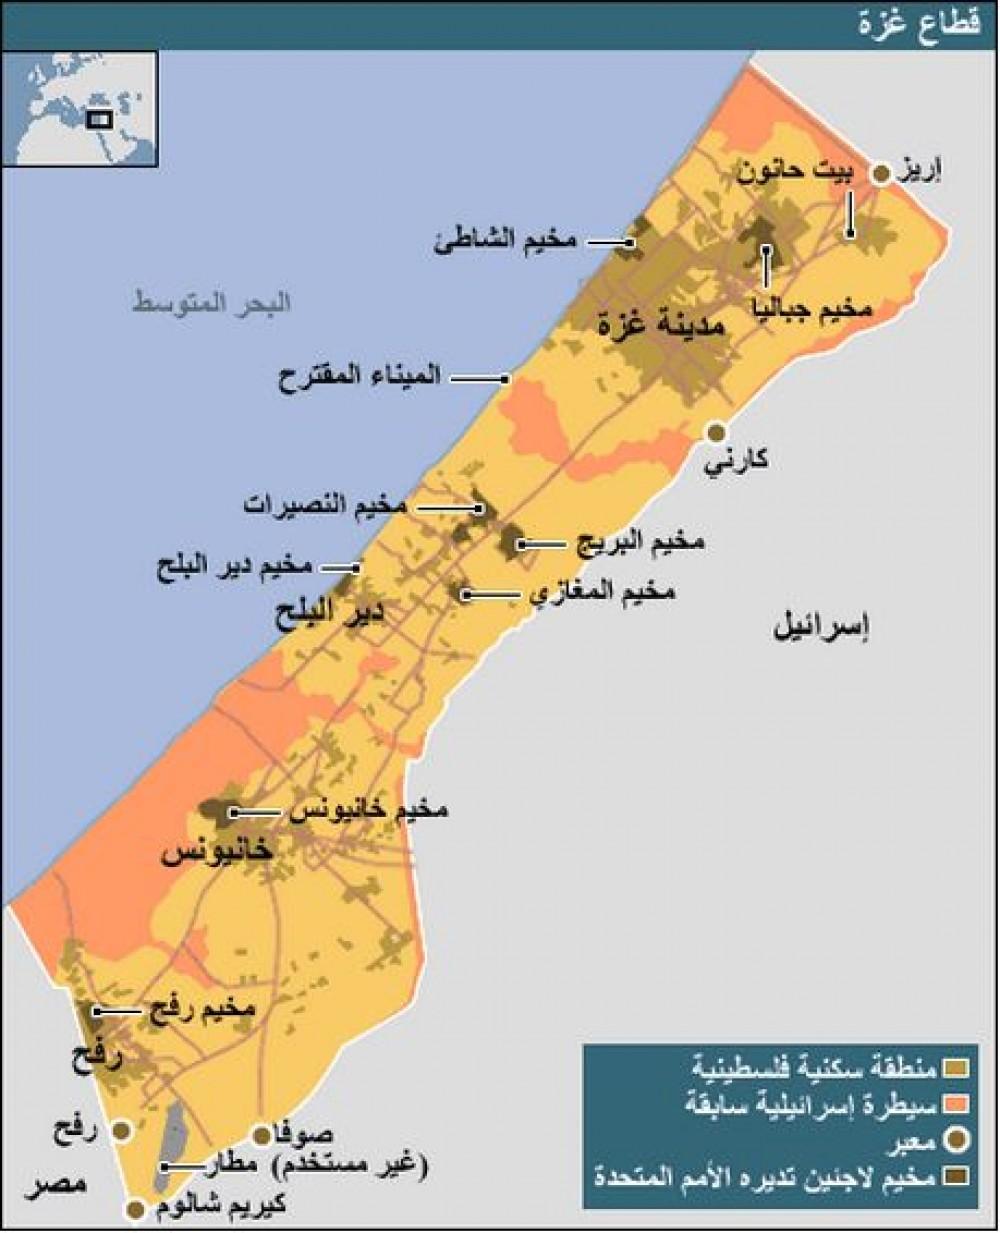 مخيمات قطاع غزة